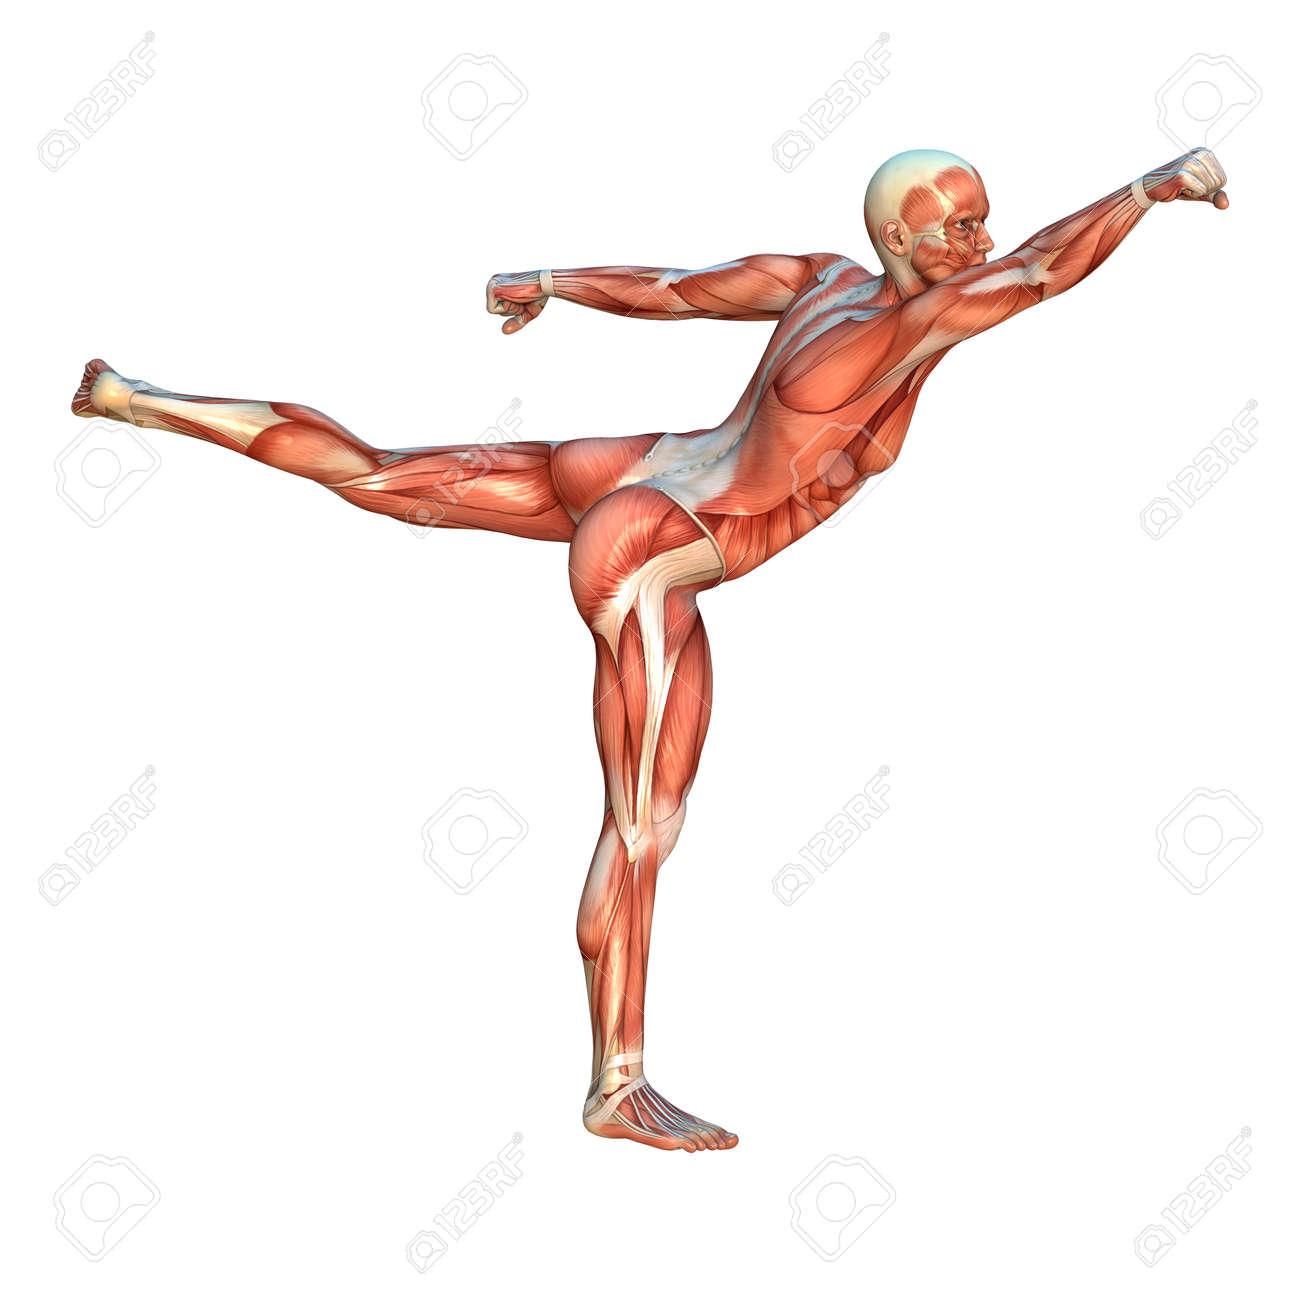 Image result for human yoke